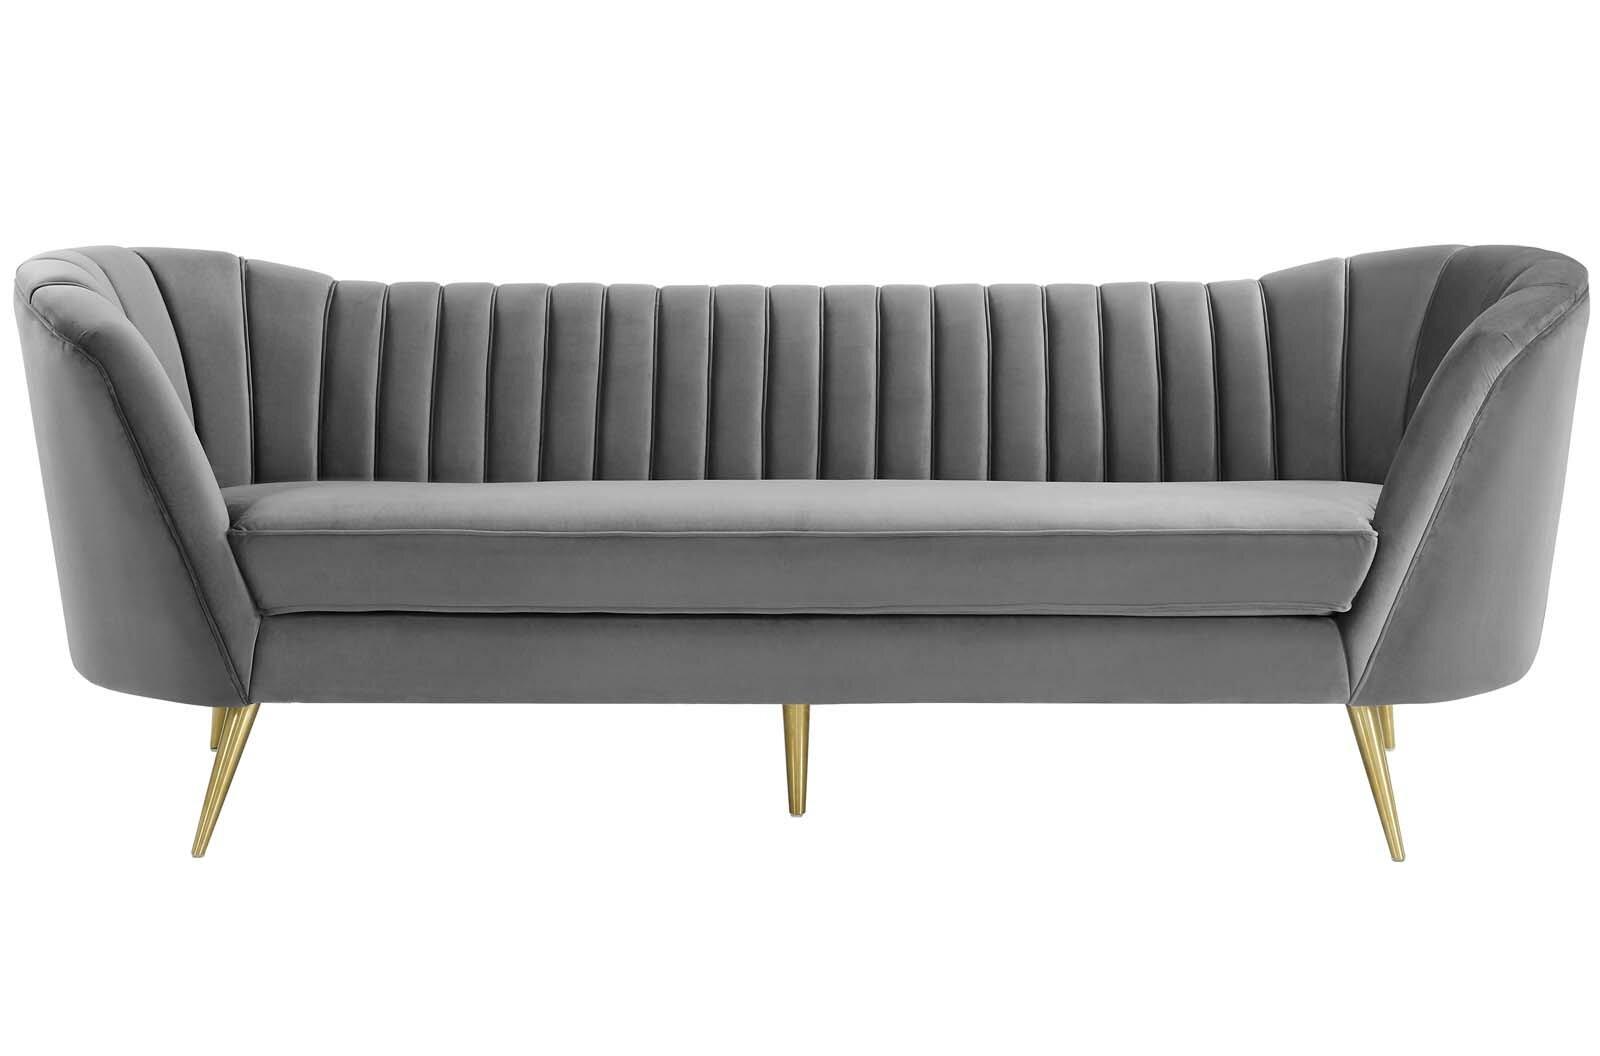 Mackin Chesterfield Sofa